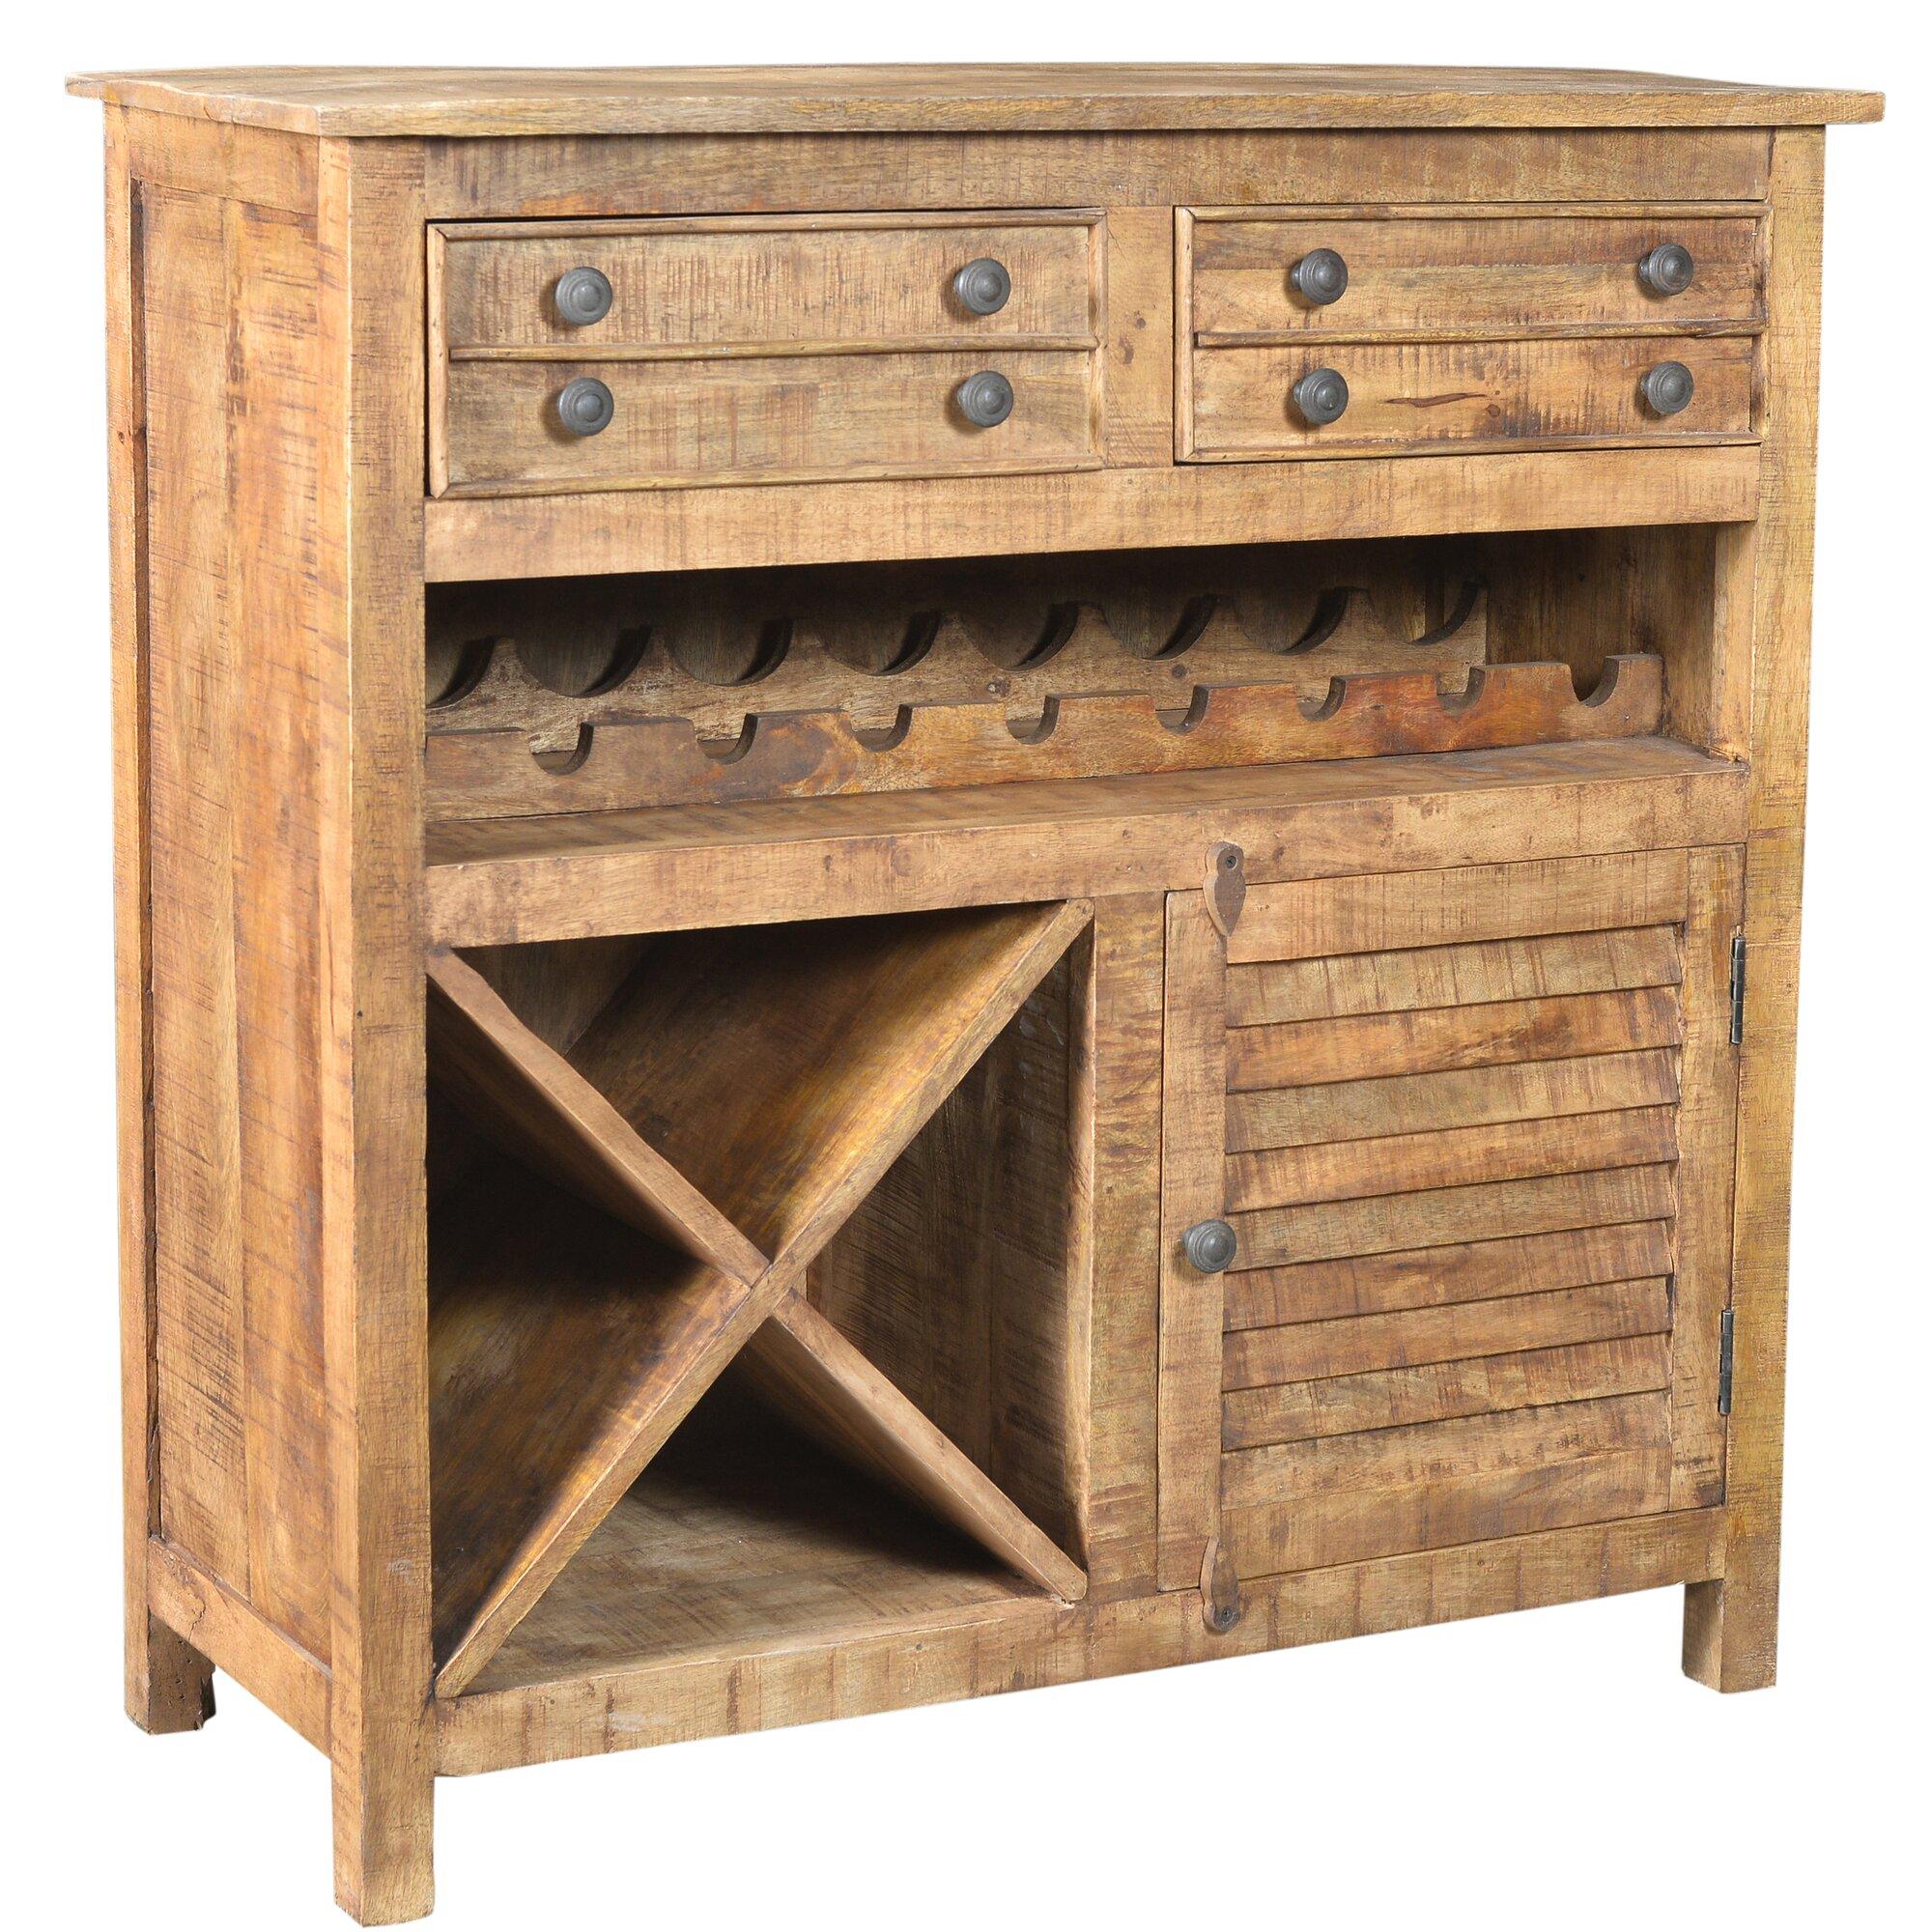 The Kitchen Door Napa: MOTI Furniture Napa Floor Wine Cabinet